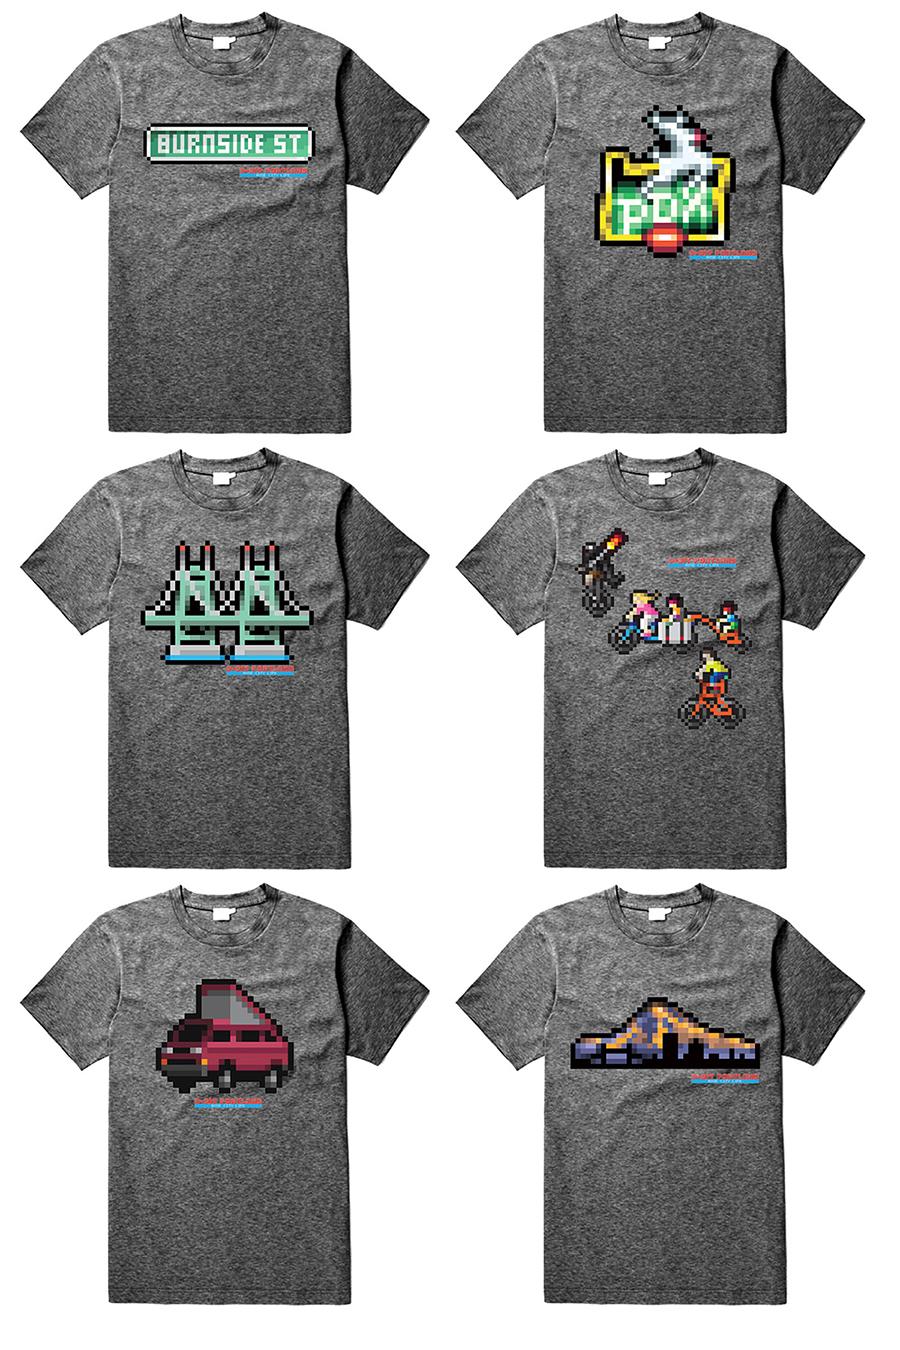 t-shirt-selection-sm.jpg